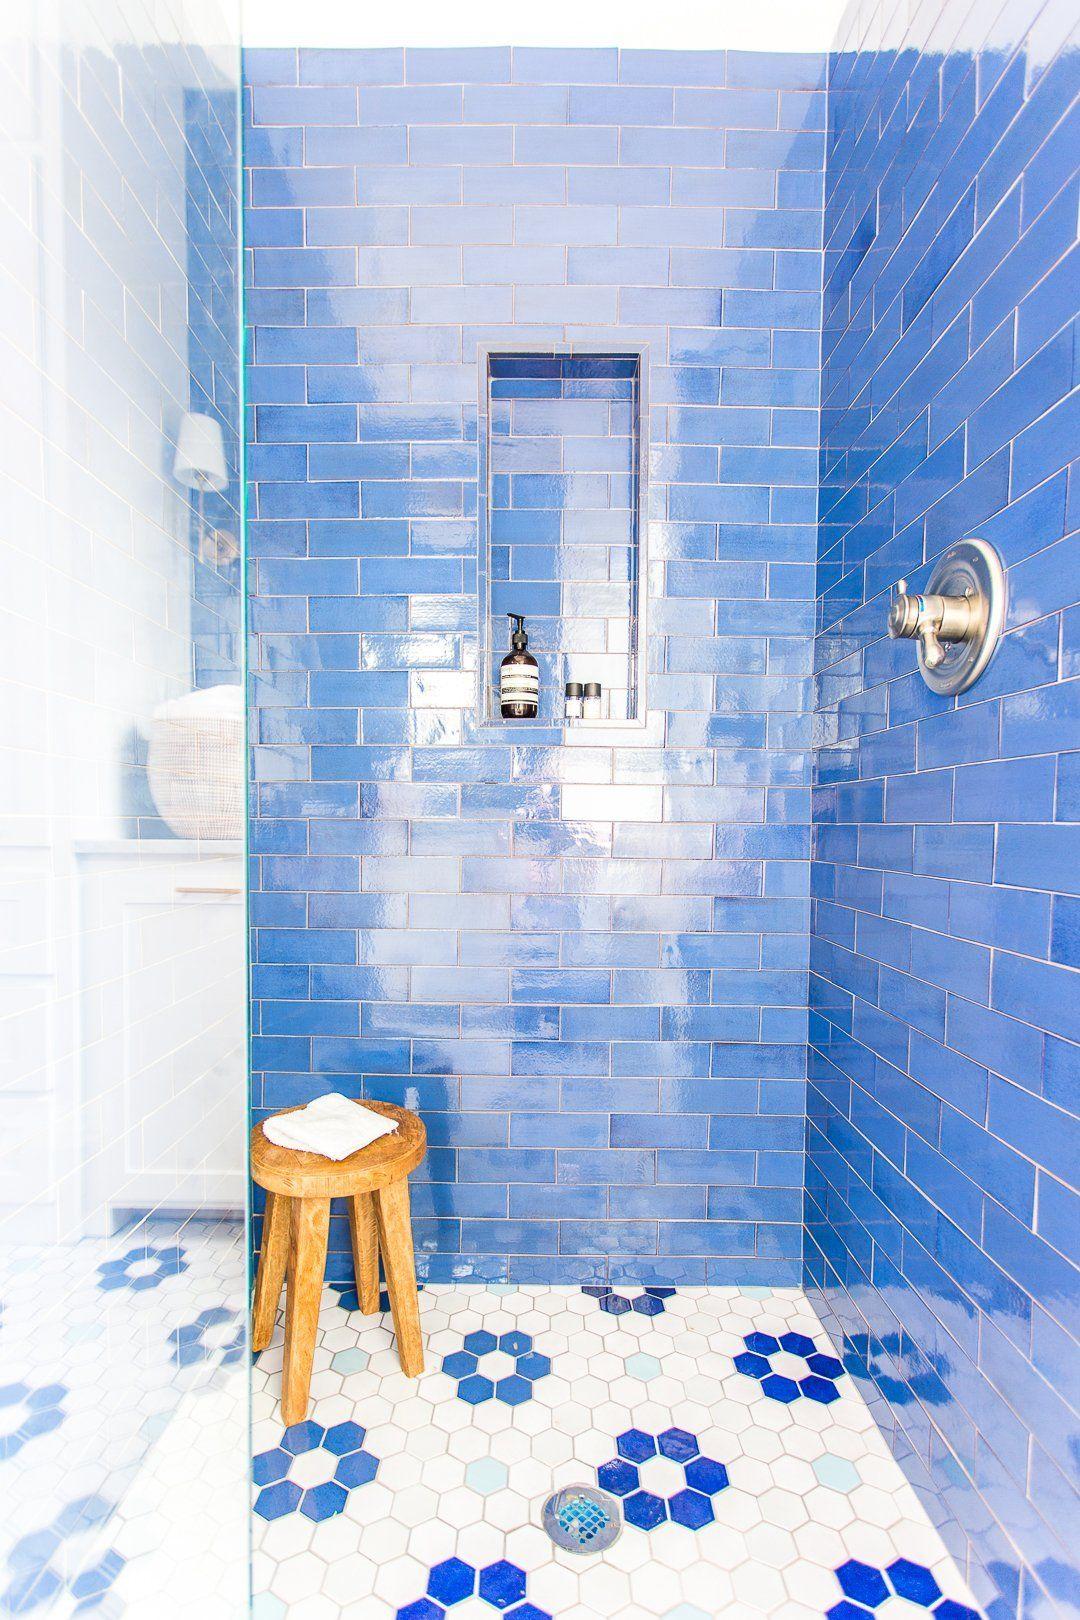 2020 Tile Trends 6 Styles We Re Excited About In 2020 Bathroom Floor Tiles Bathroom Interior Design Bathroom Flooring